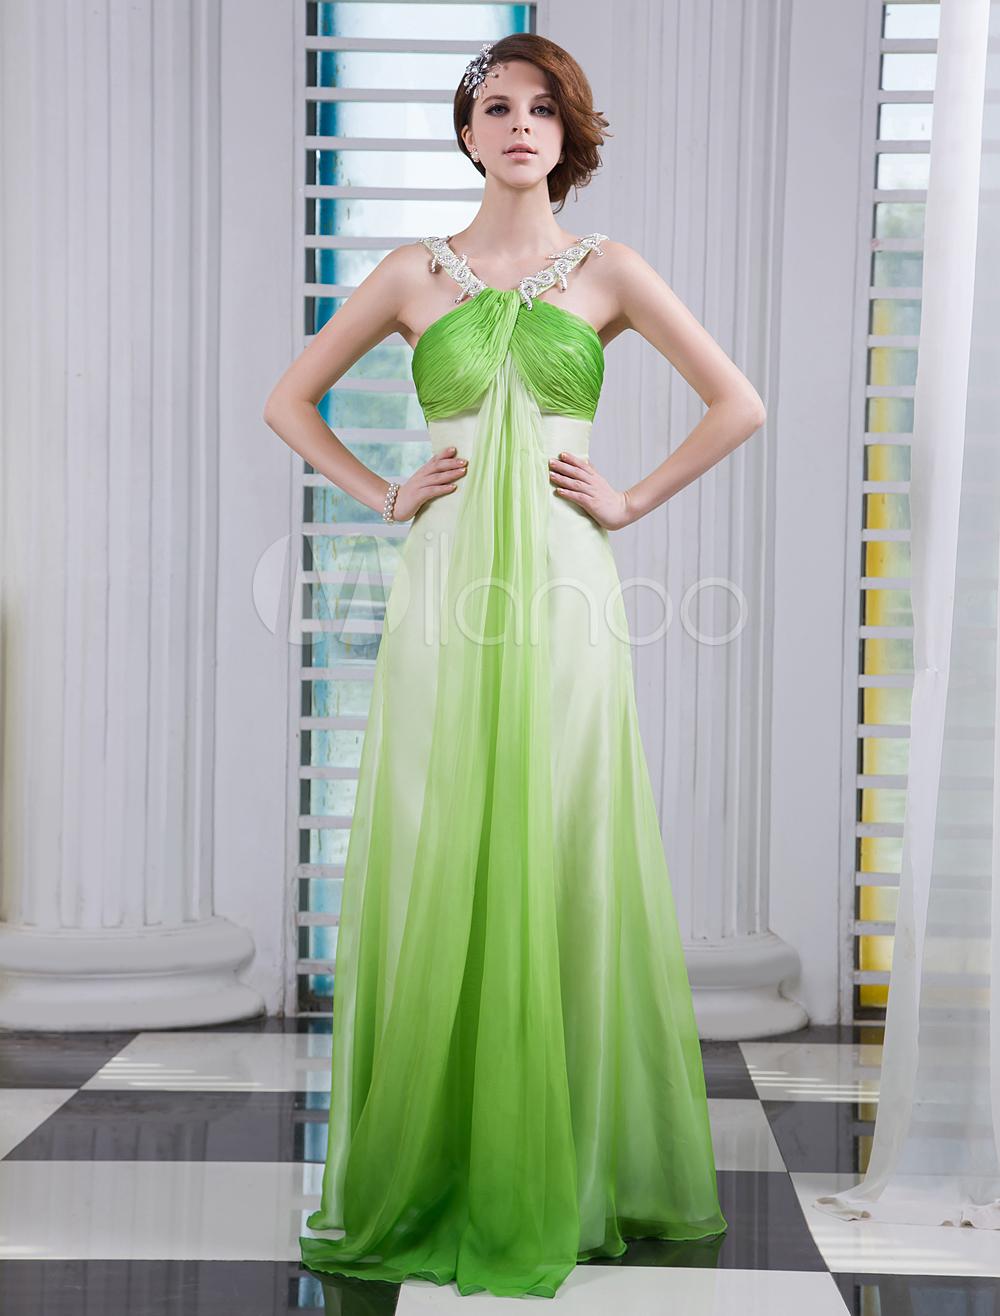 Green Halter Sleeveless Rhinestone Sheath Chiffon Prom Dress Milanoo (Wedding Prom Dresses) photo